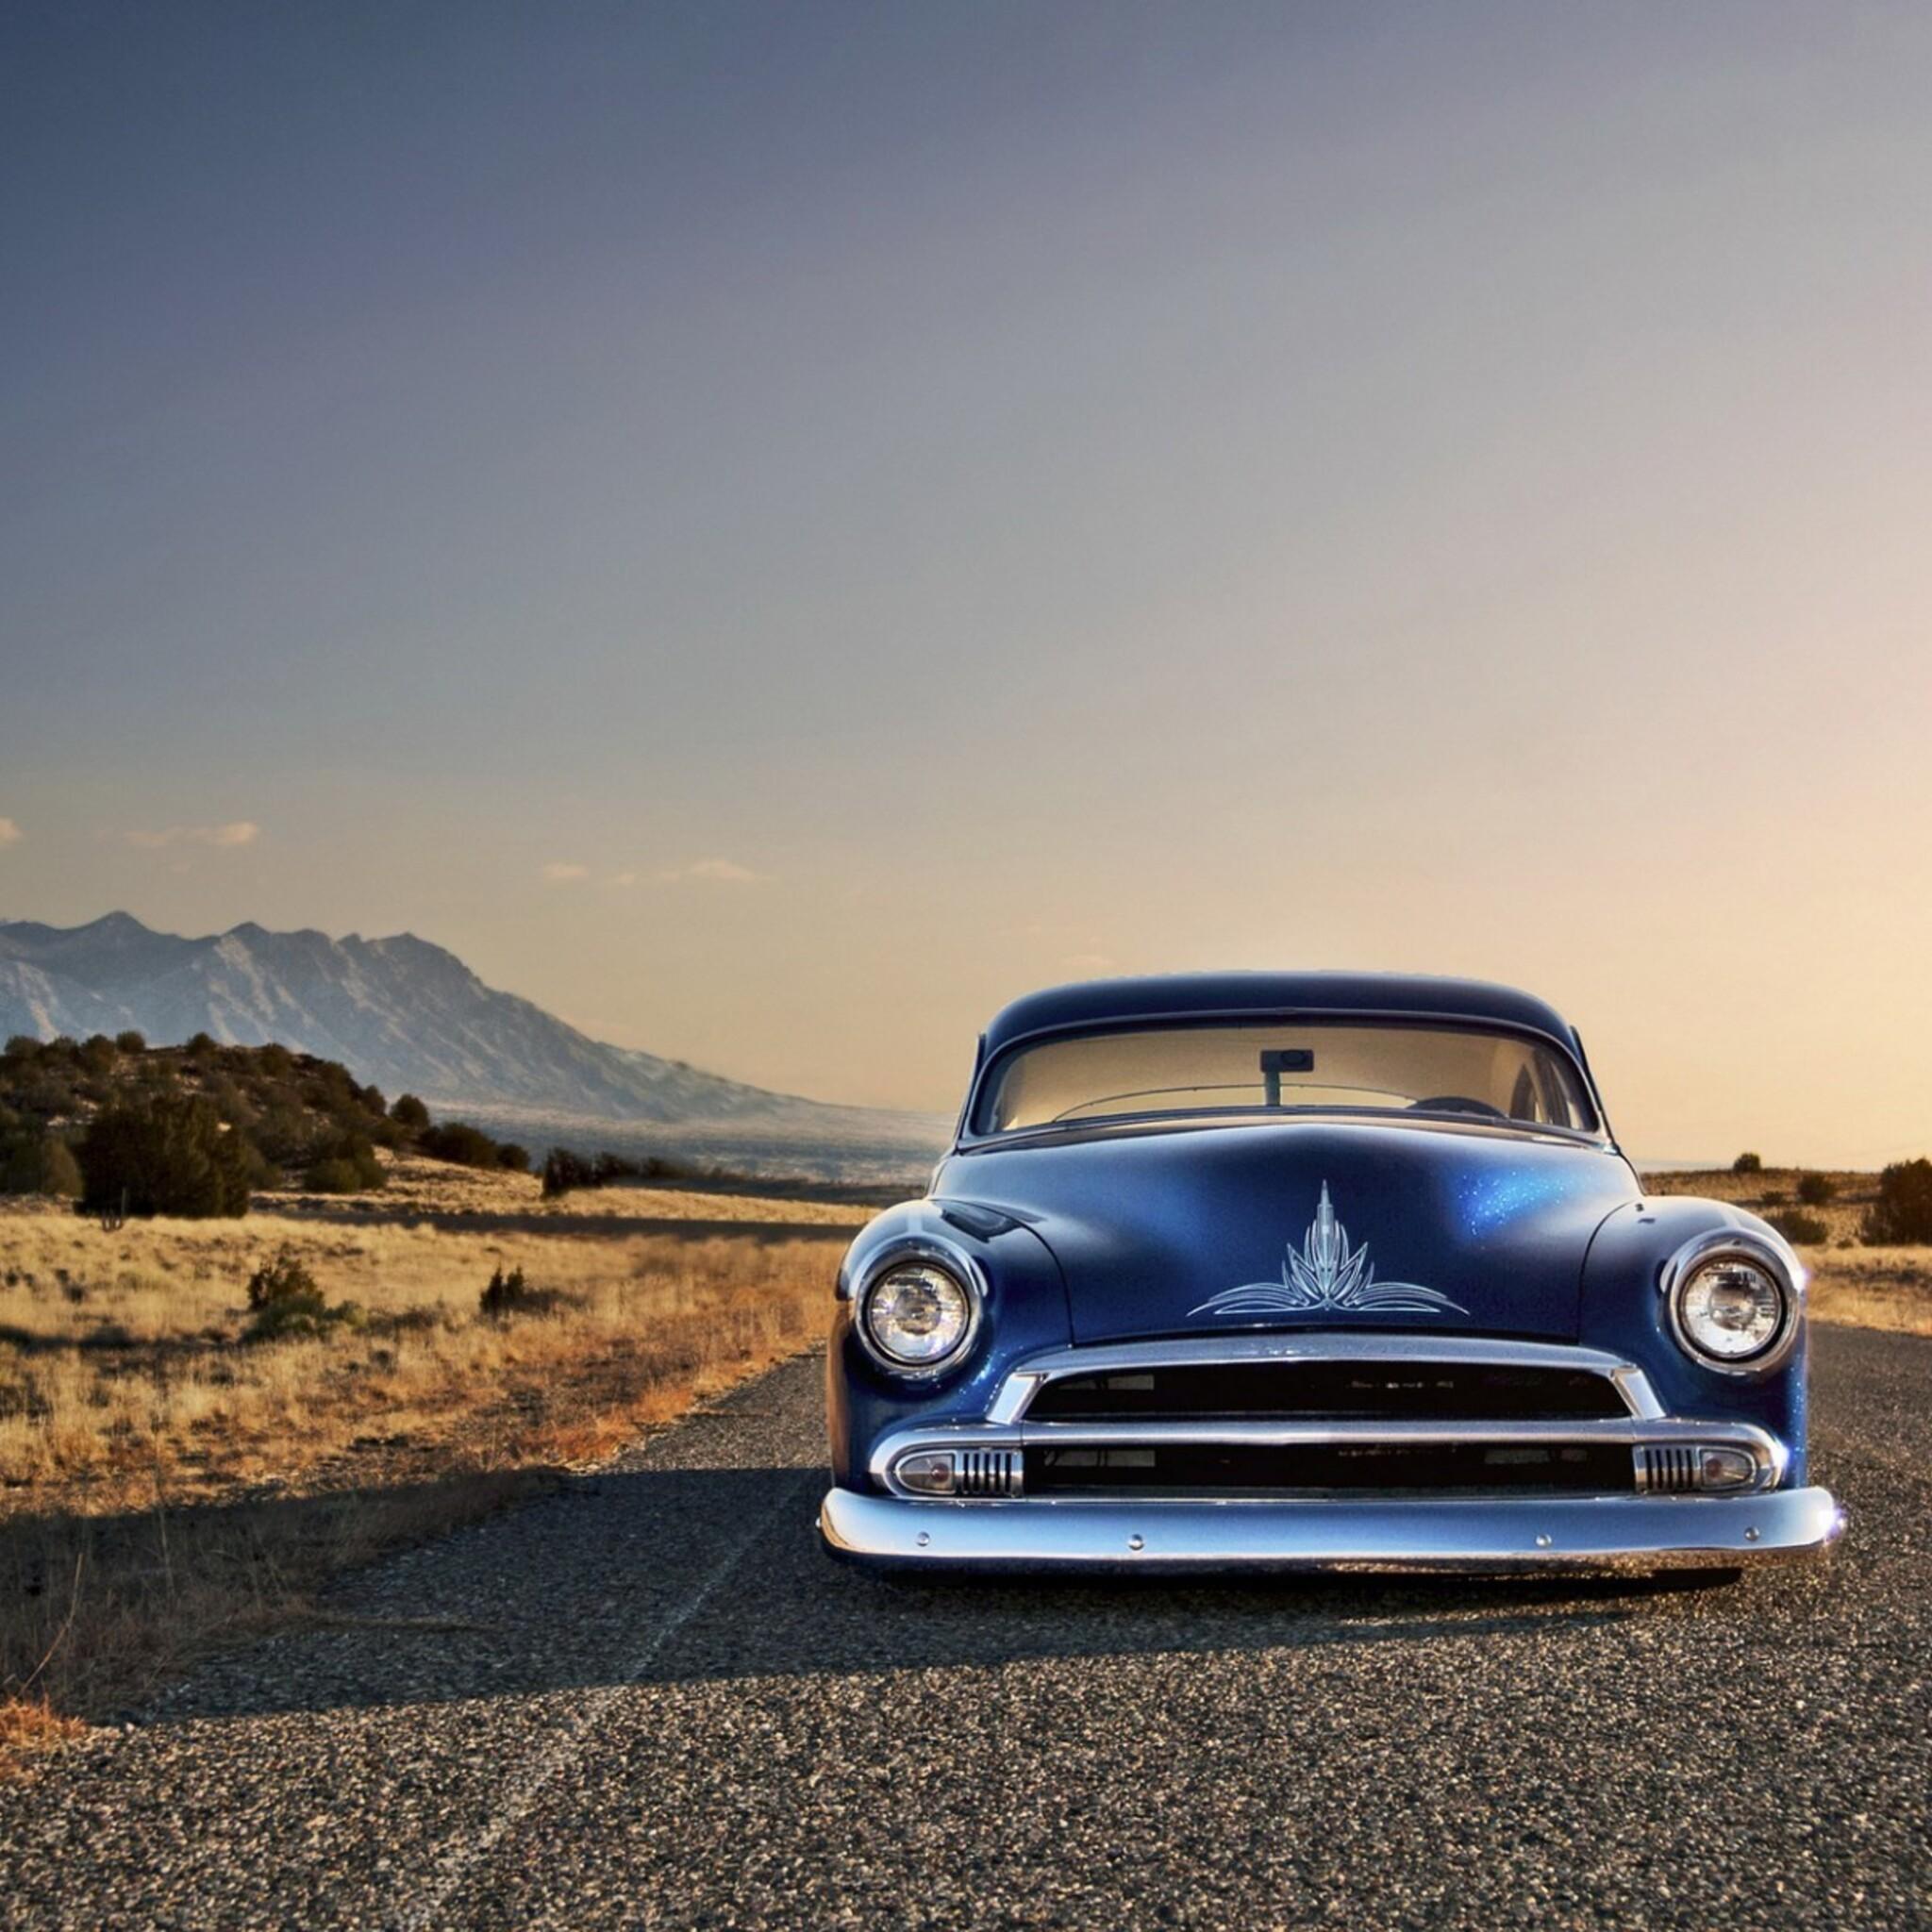 Chevrolet Car Wallpaper: 2048x2048 Hot Rod Chevrolet 1 Ipad Air HD 4k Wallpapers